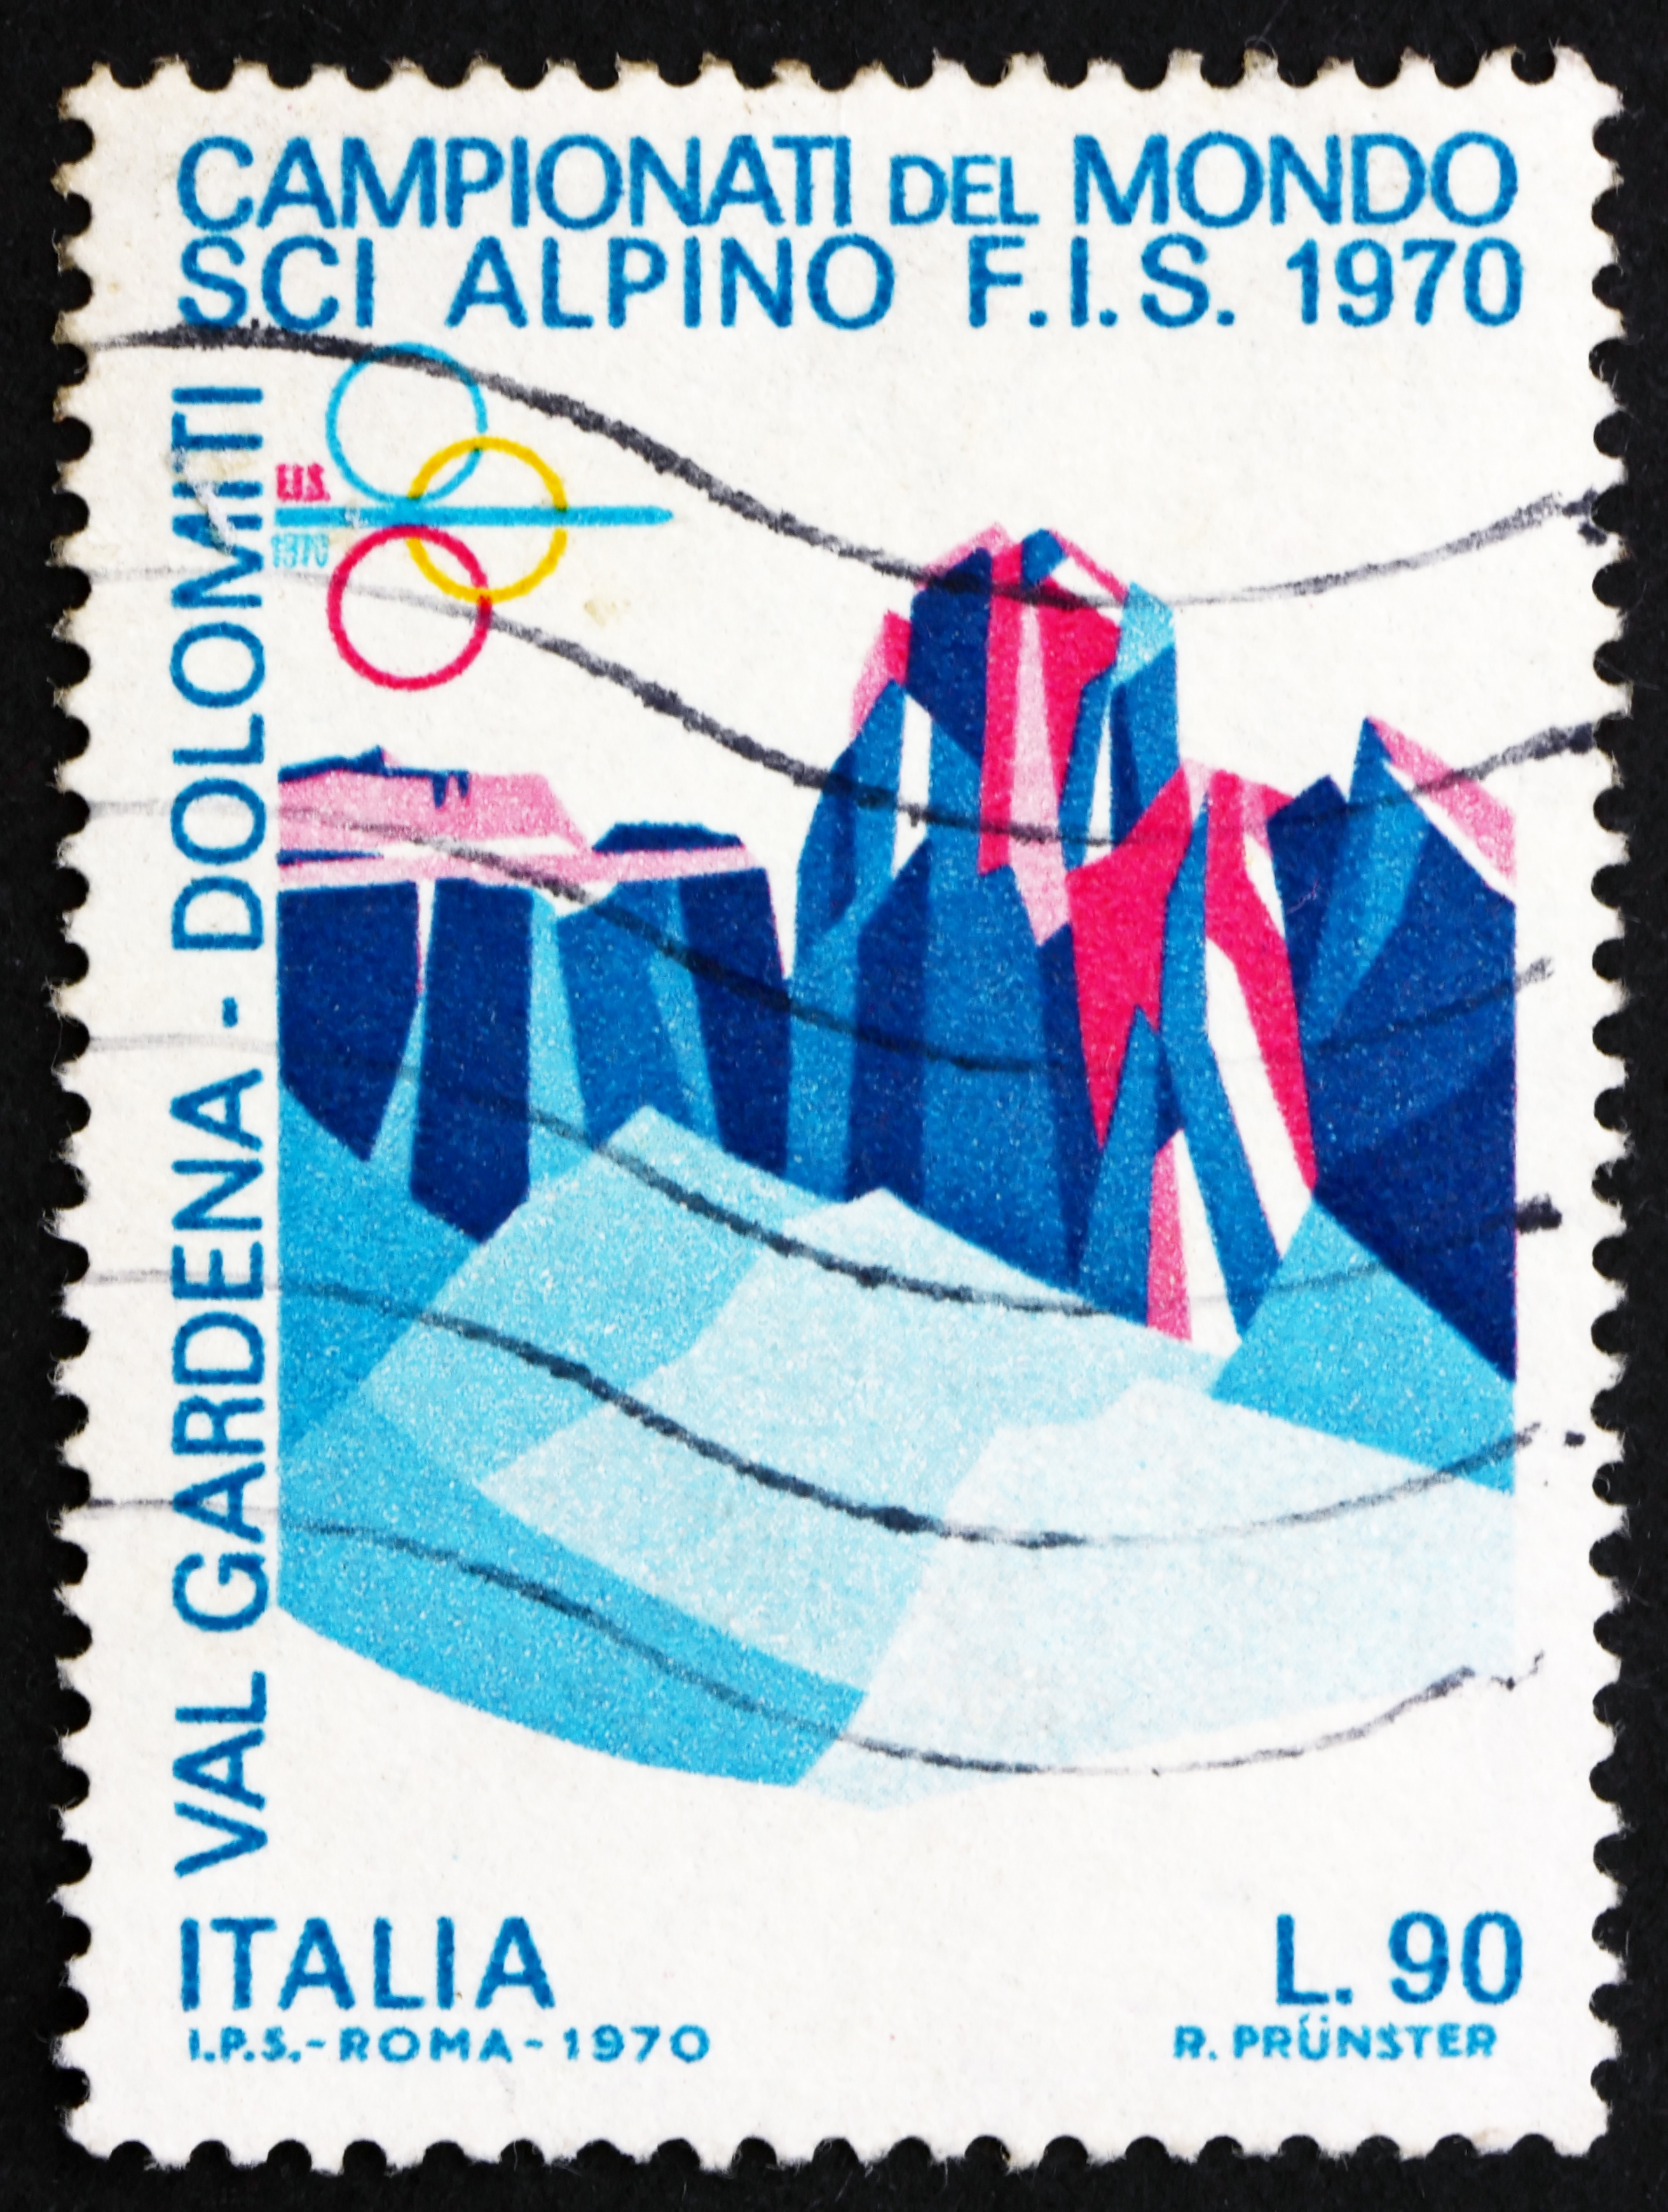 italian dolemites stamp - Boris15 - shutterstock